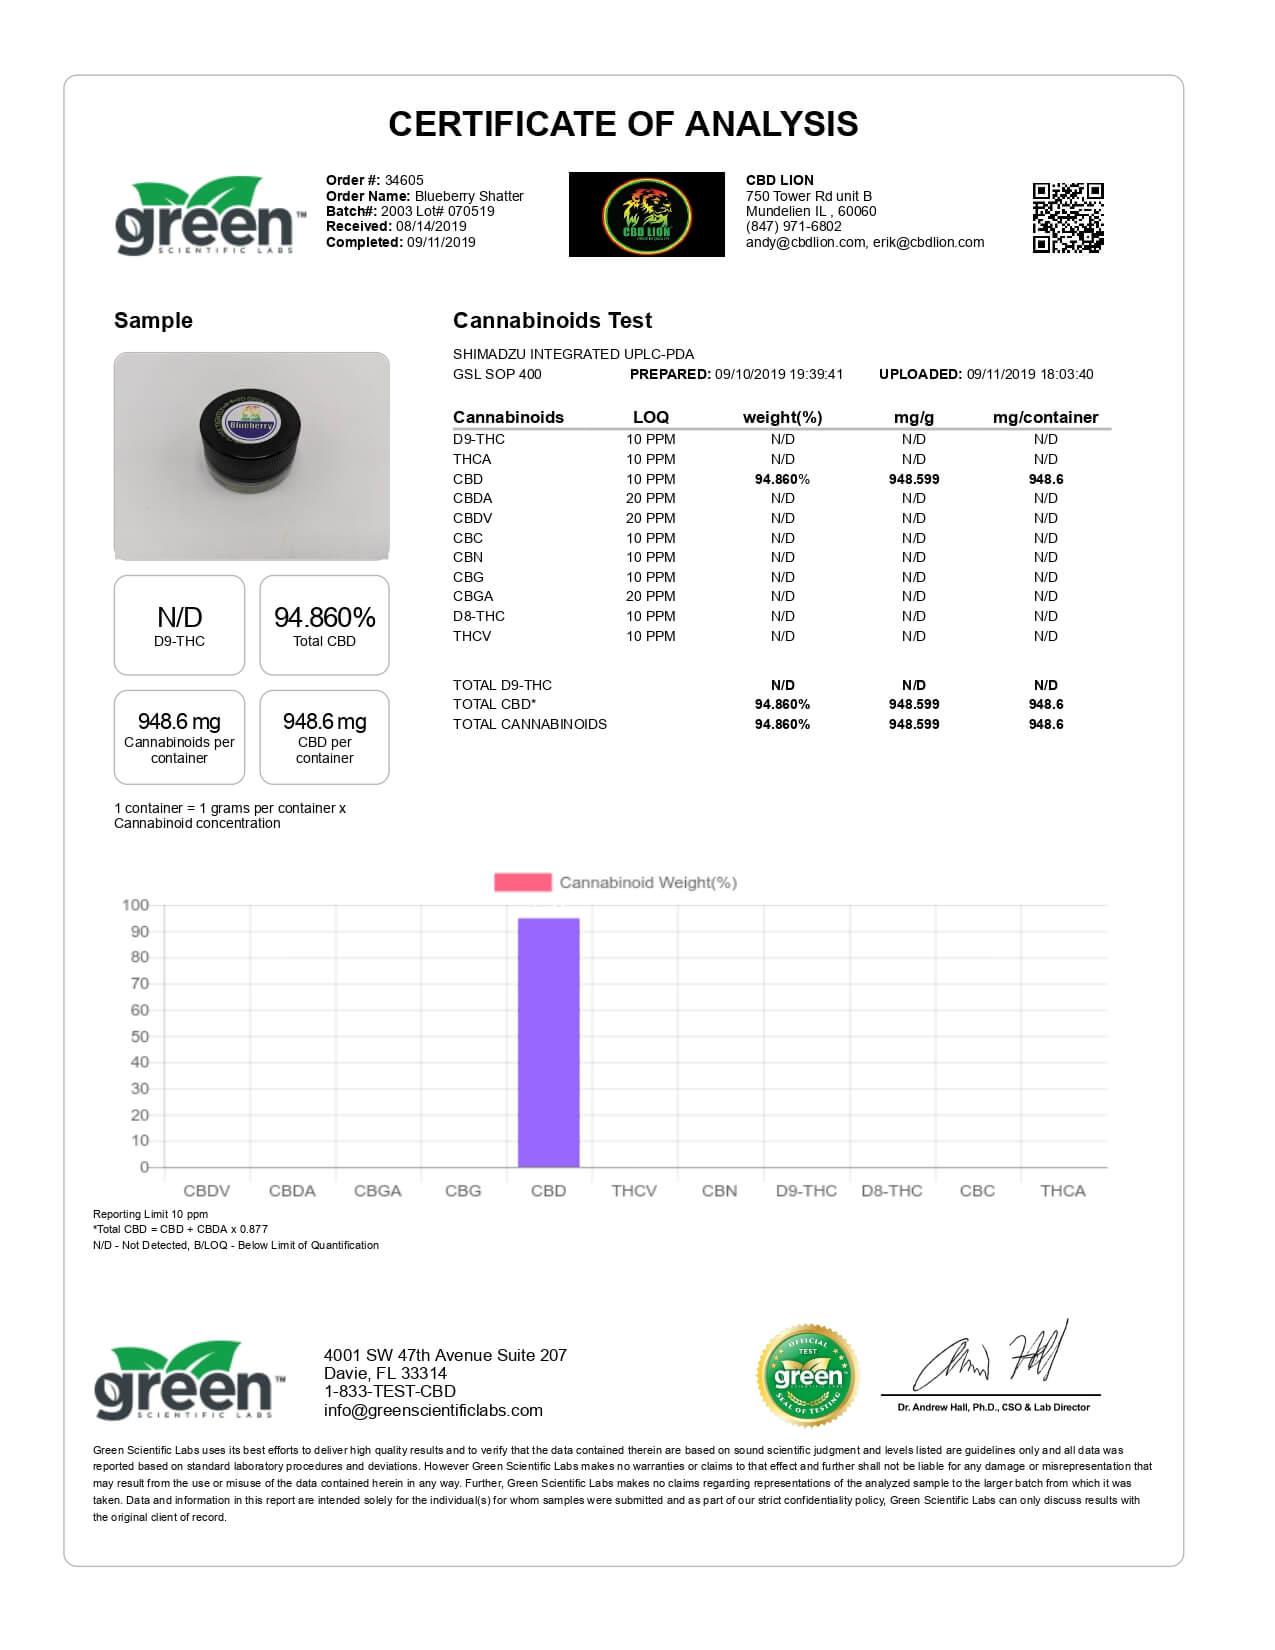 CBD Lion CBD Concentrate Blueberry Shatter 1g Lab Report